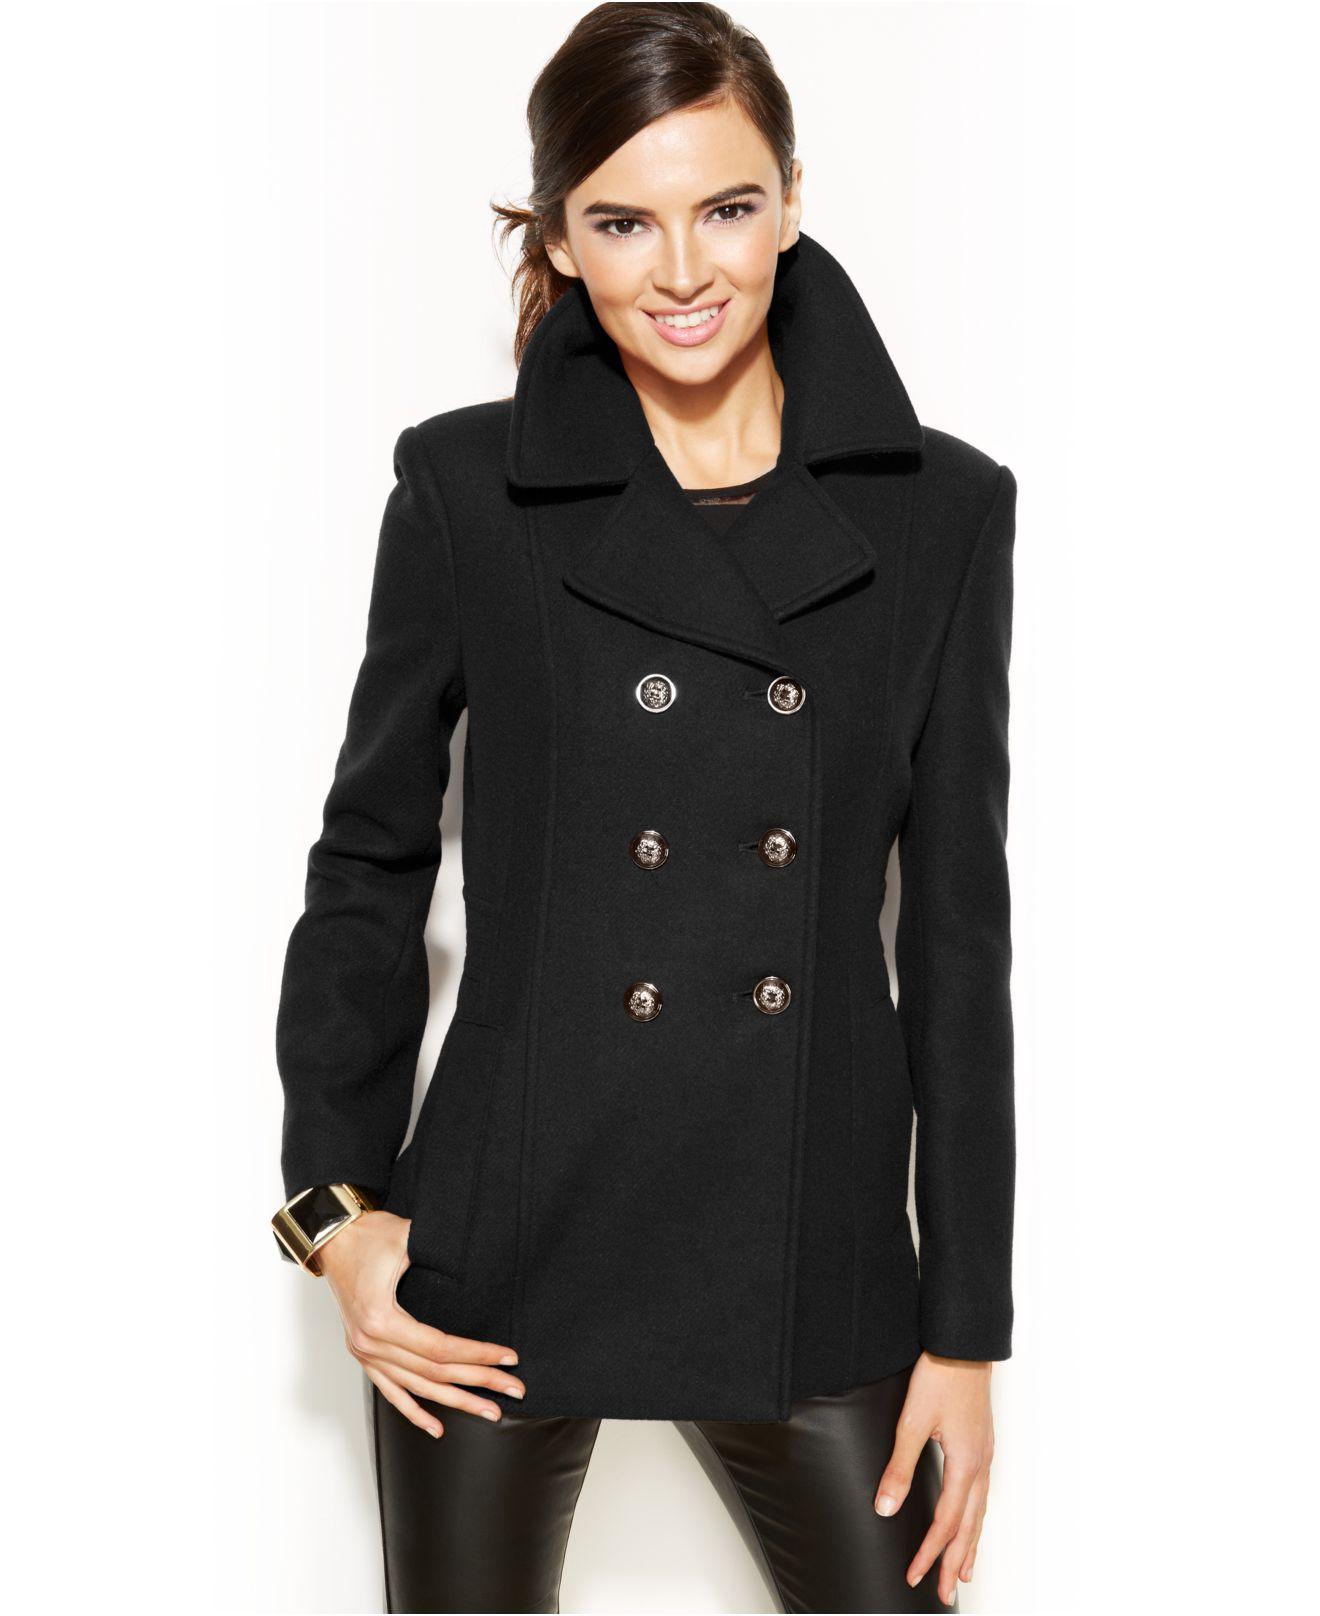 64b782e25e INC International Concepts Double-Breasted Pea Coat in Black - Lyst